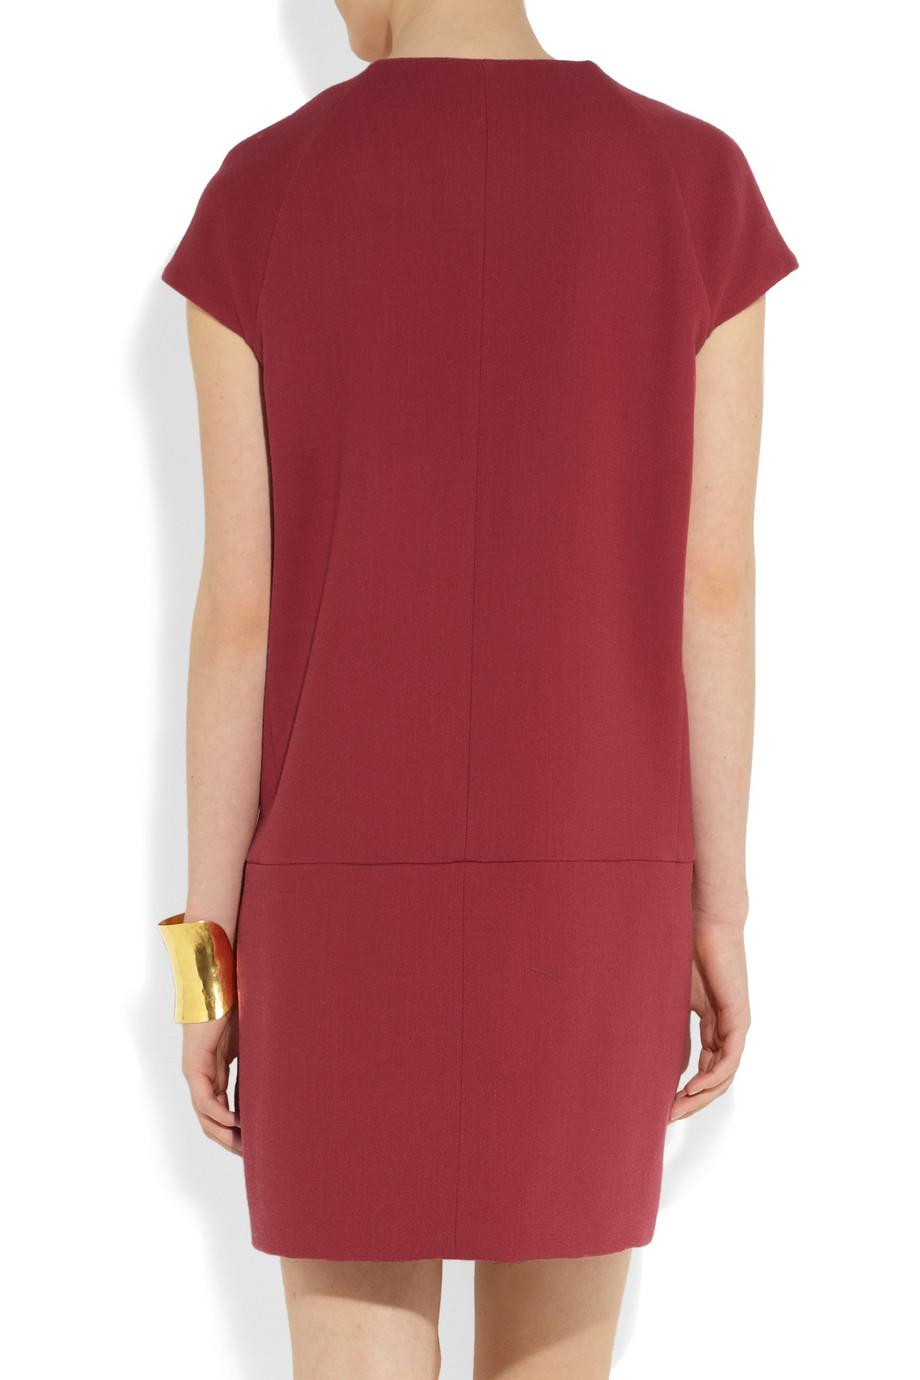 Victoria Victoria Beckham Wool Crepe Mini Dress In Red Lyst